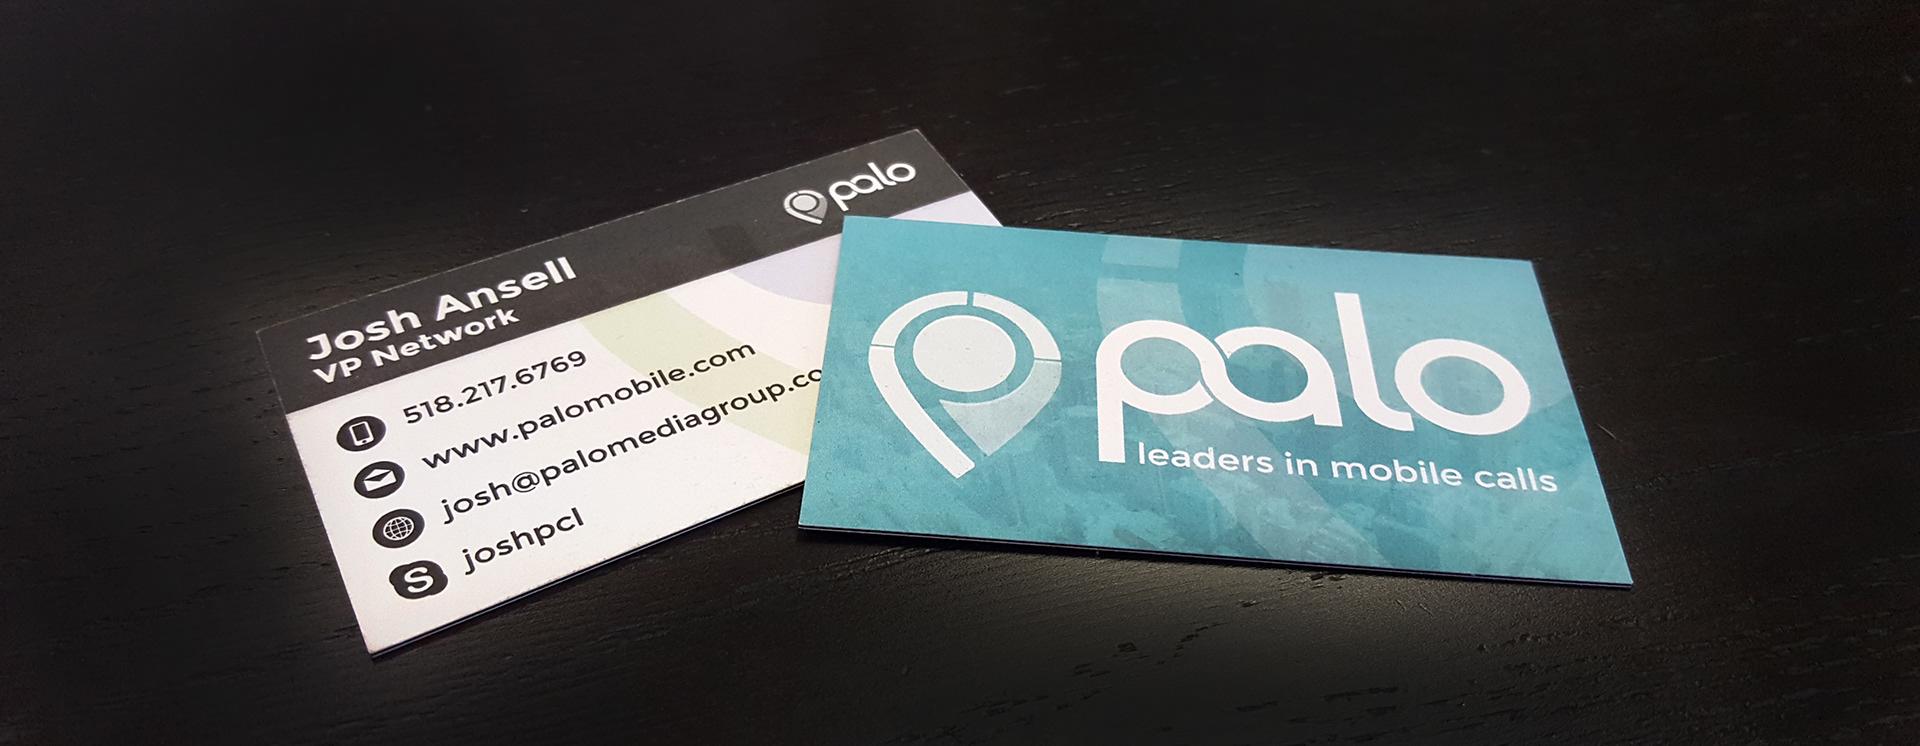 palo mobile business card design - Mobile Business Card